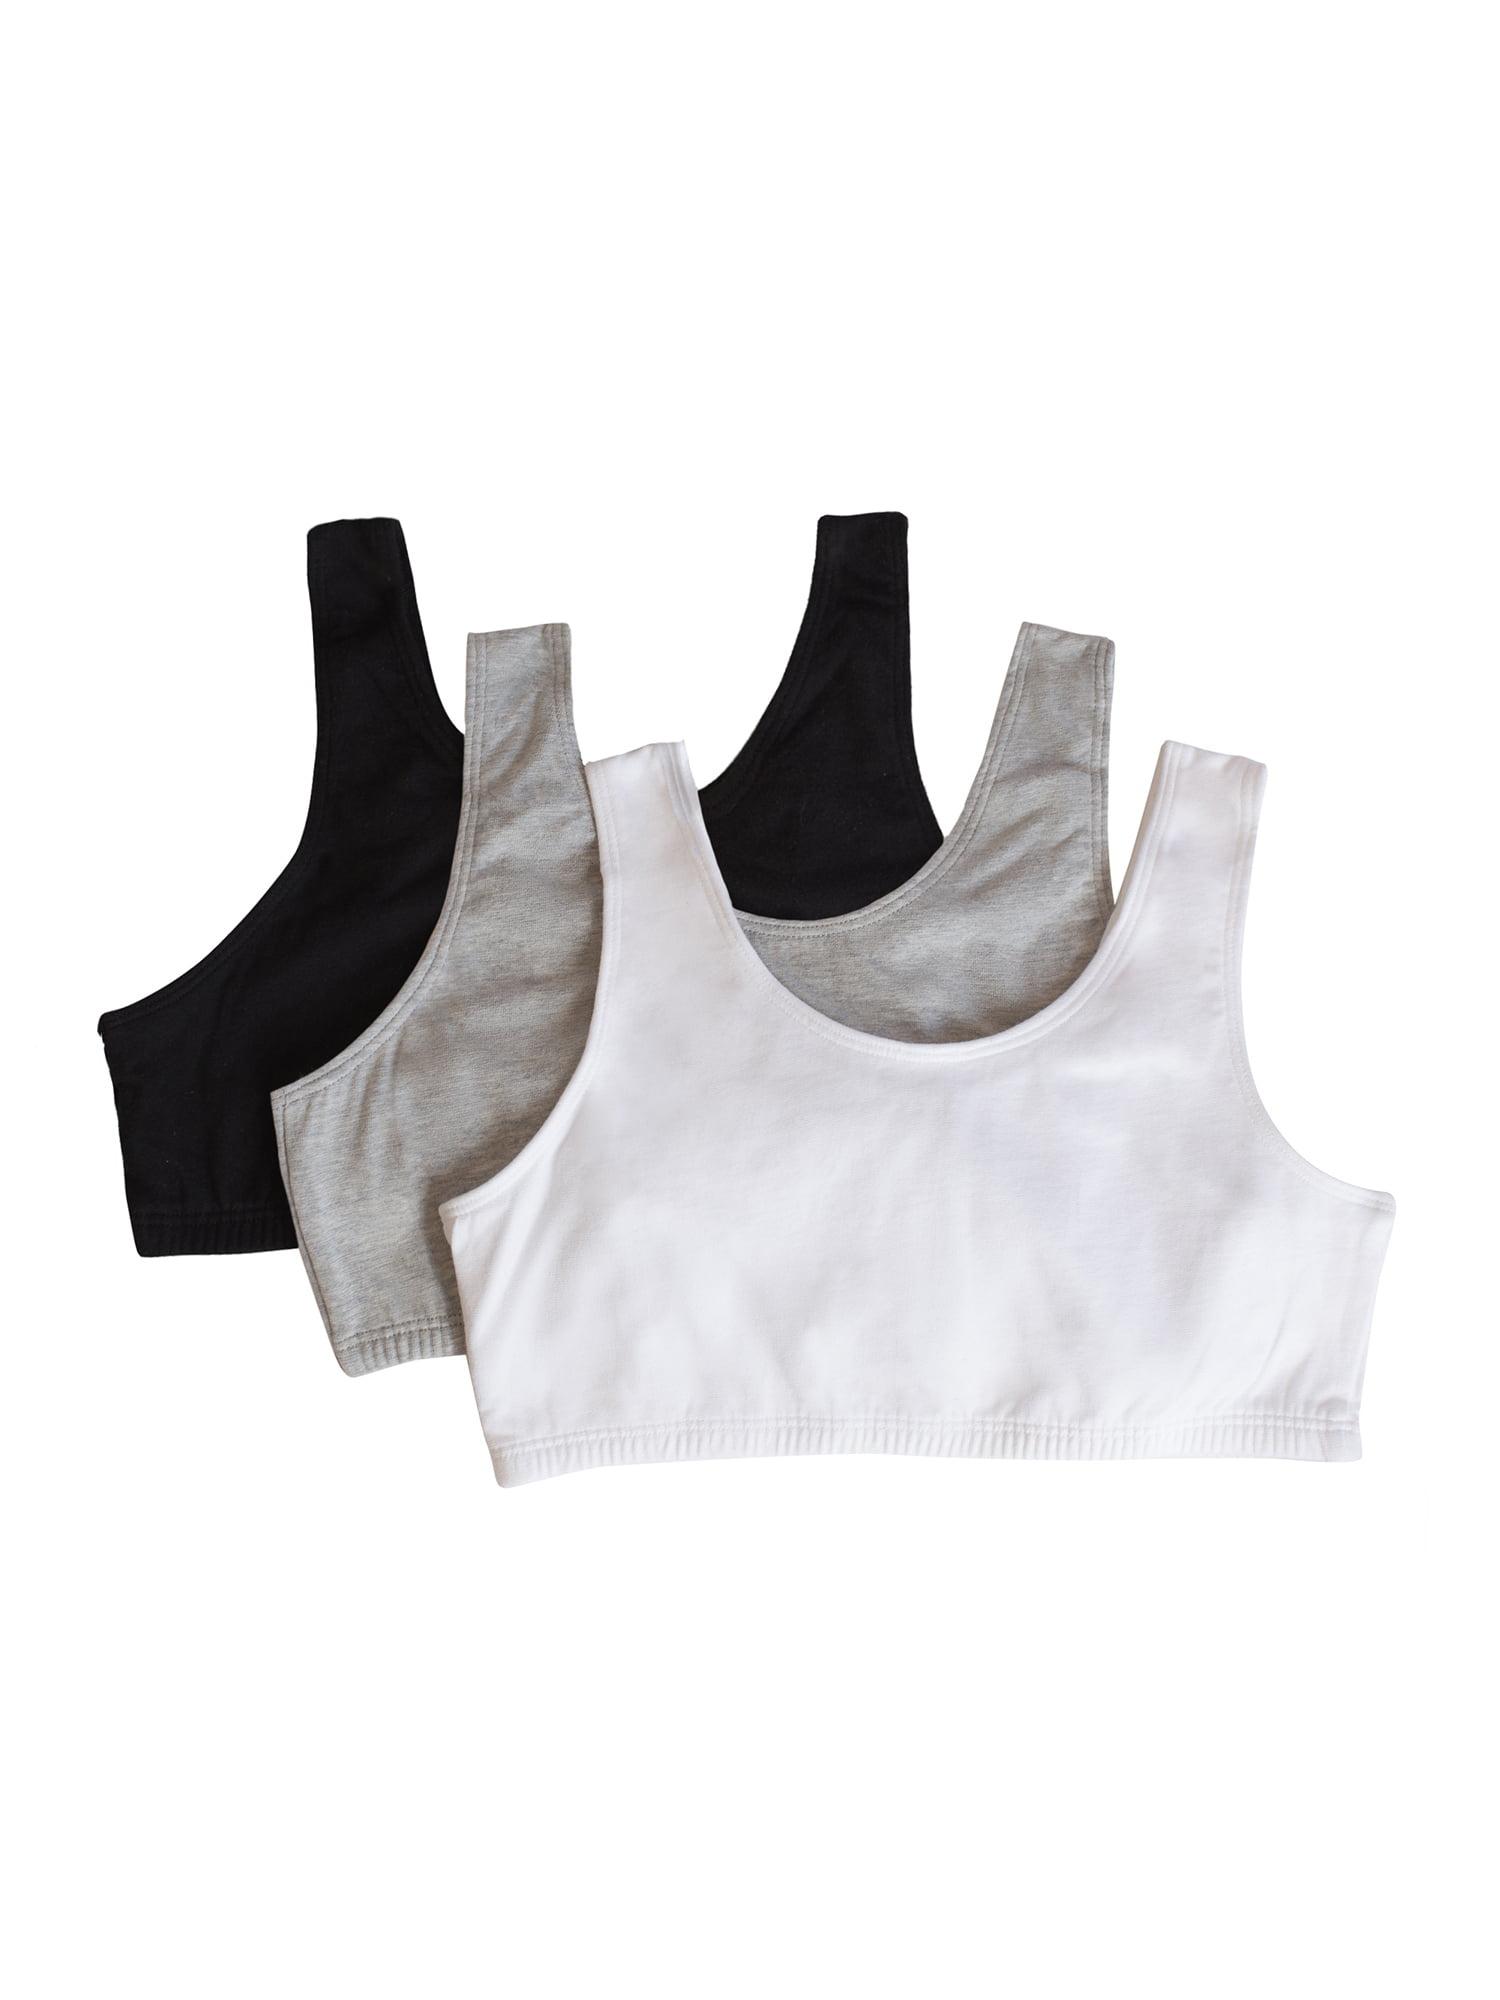 Girls Built Up Strap Cotton Sport Bra, 3 Pack